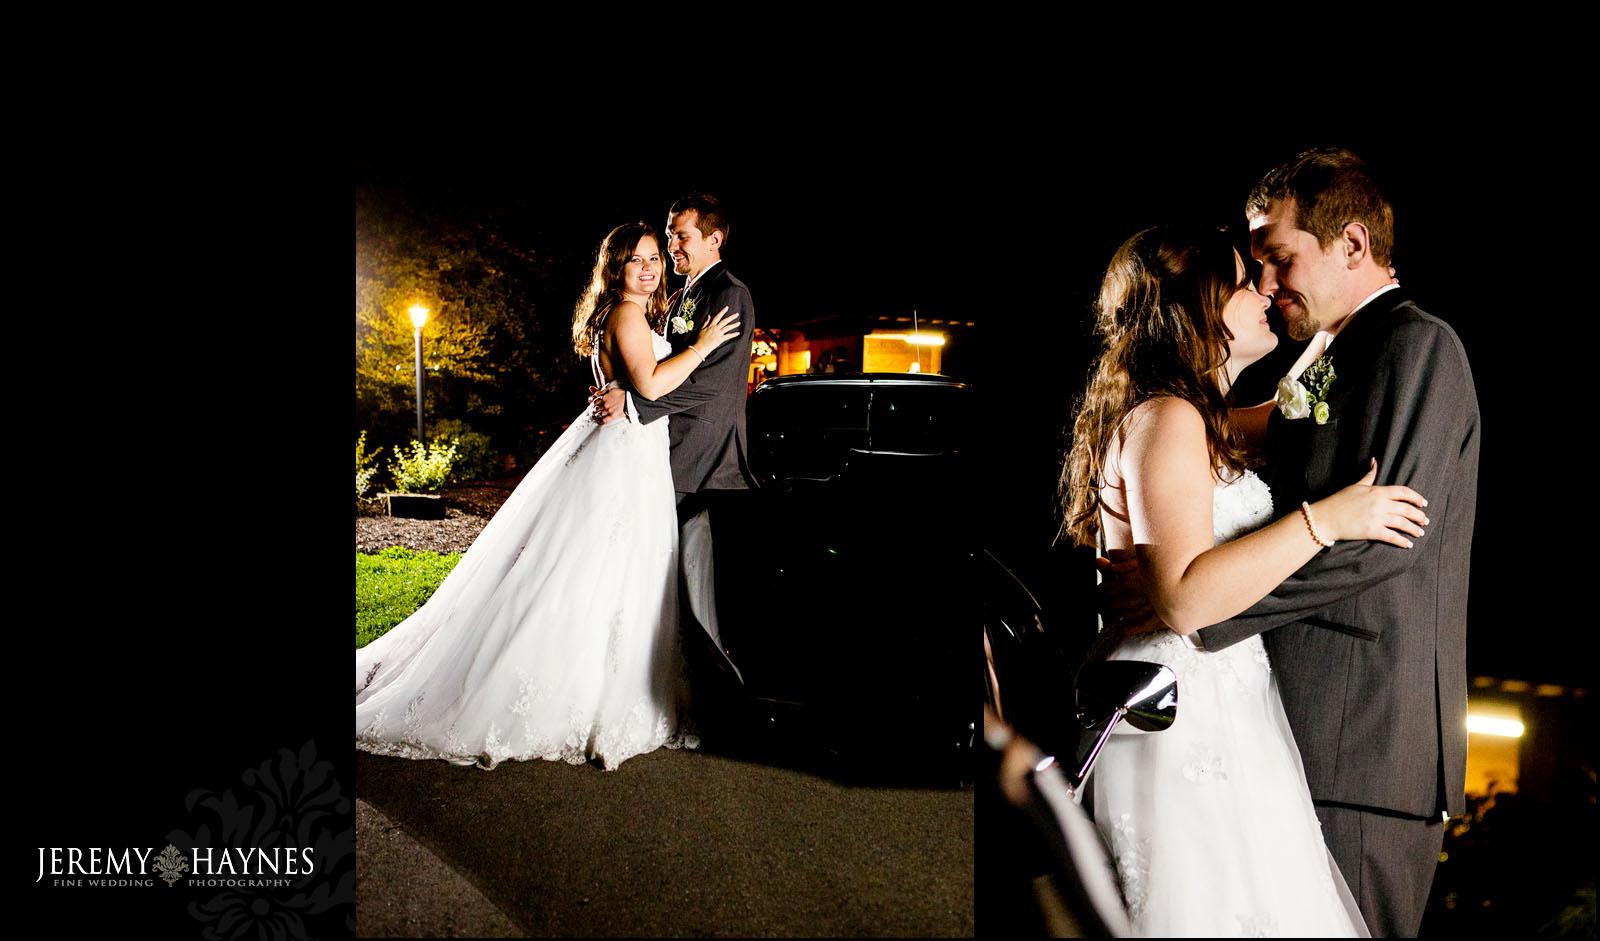 creative-avon-gardens-wedding-couple-photo-session-jeremy-haynes-photography.jpg